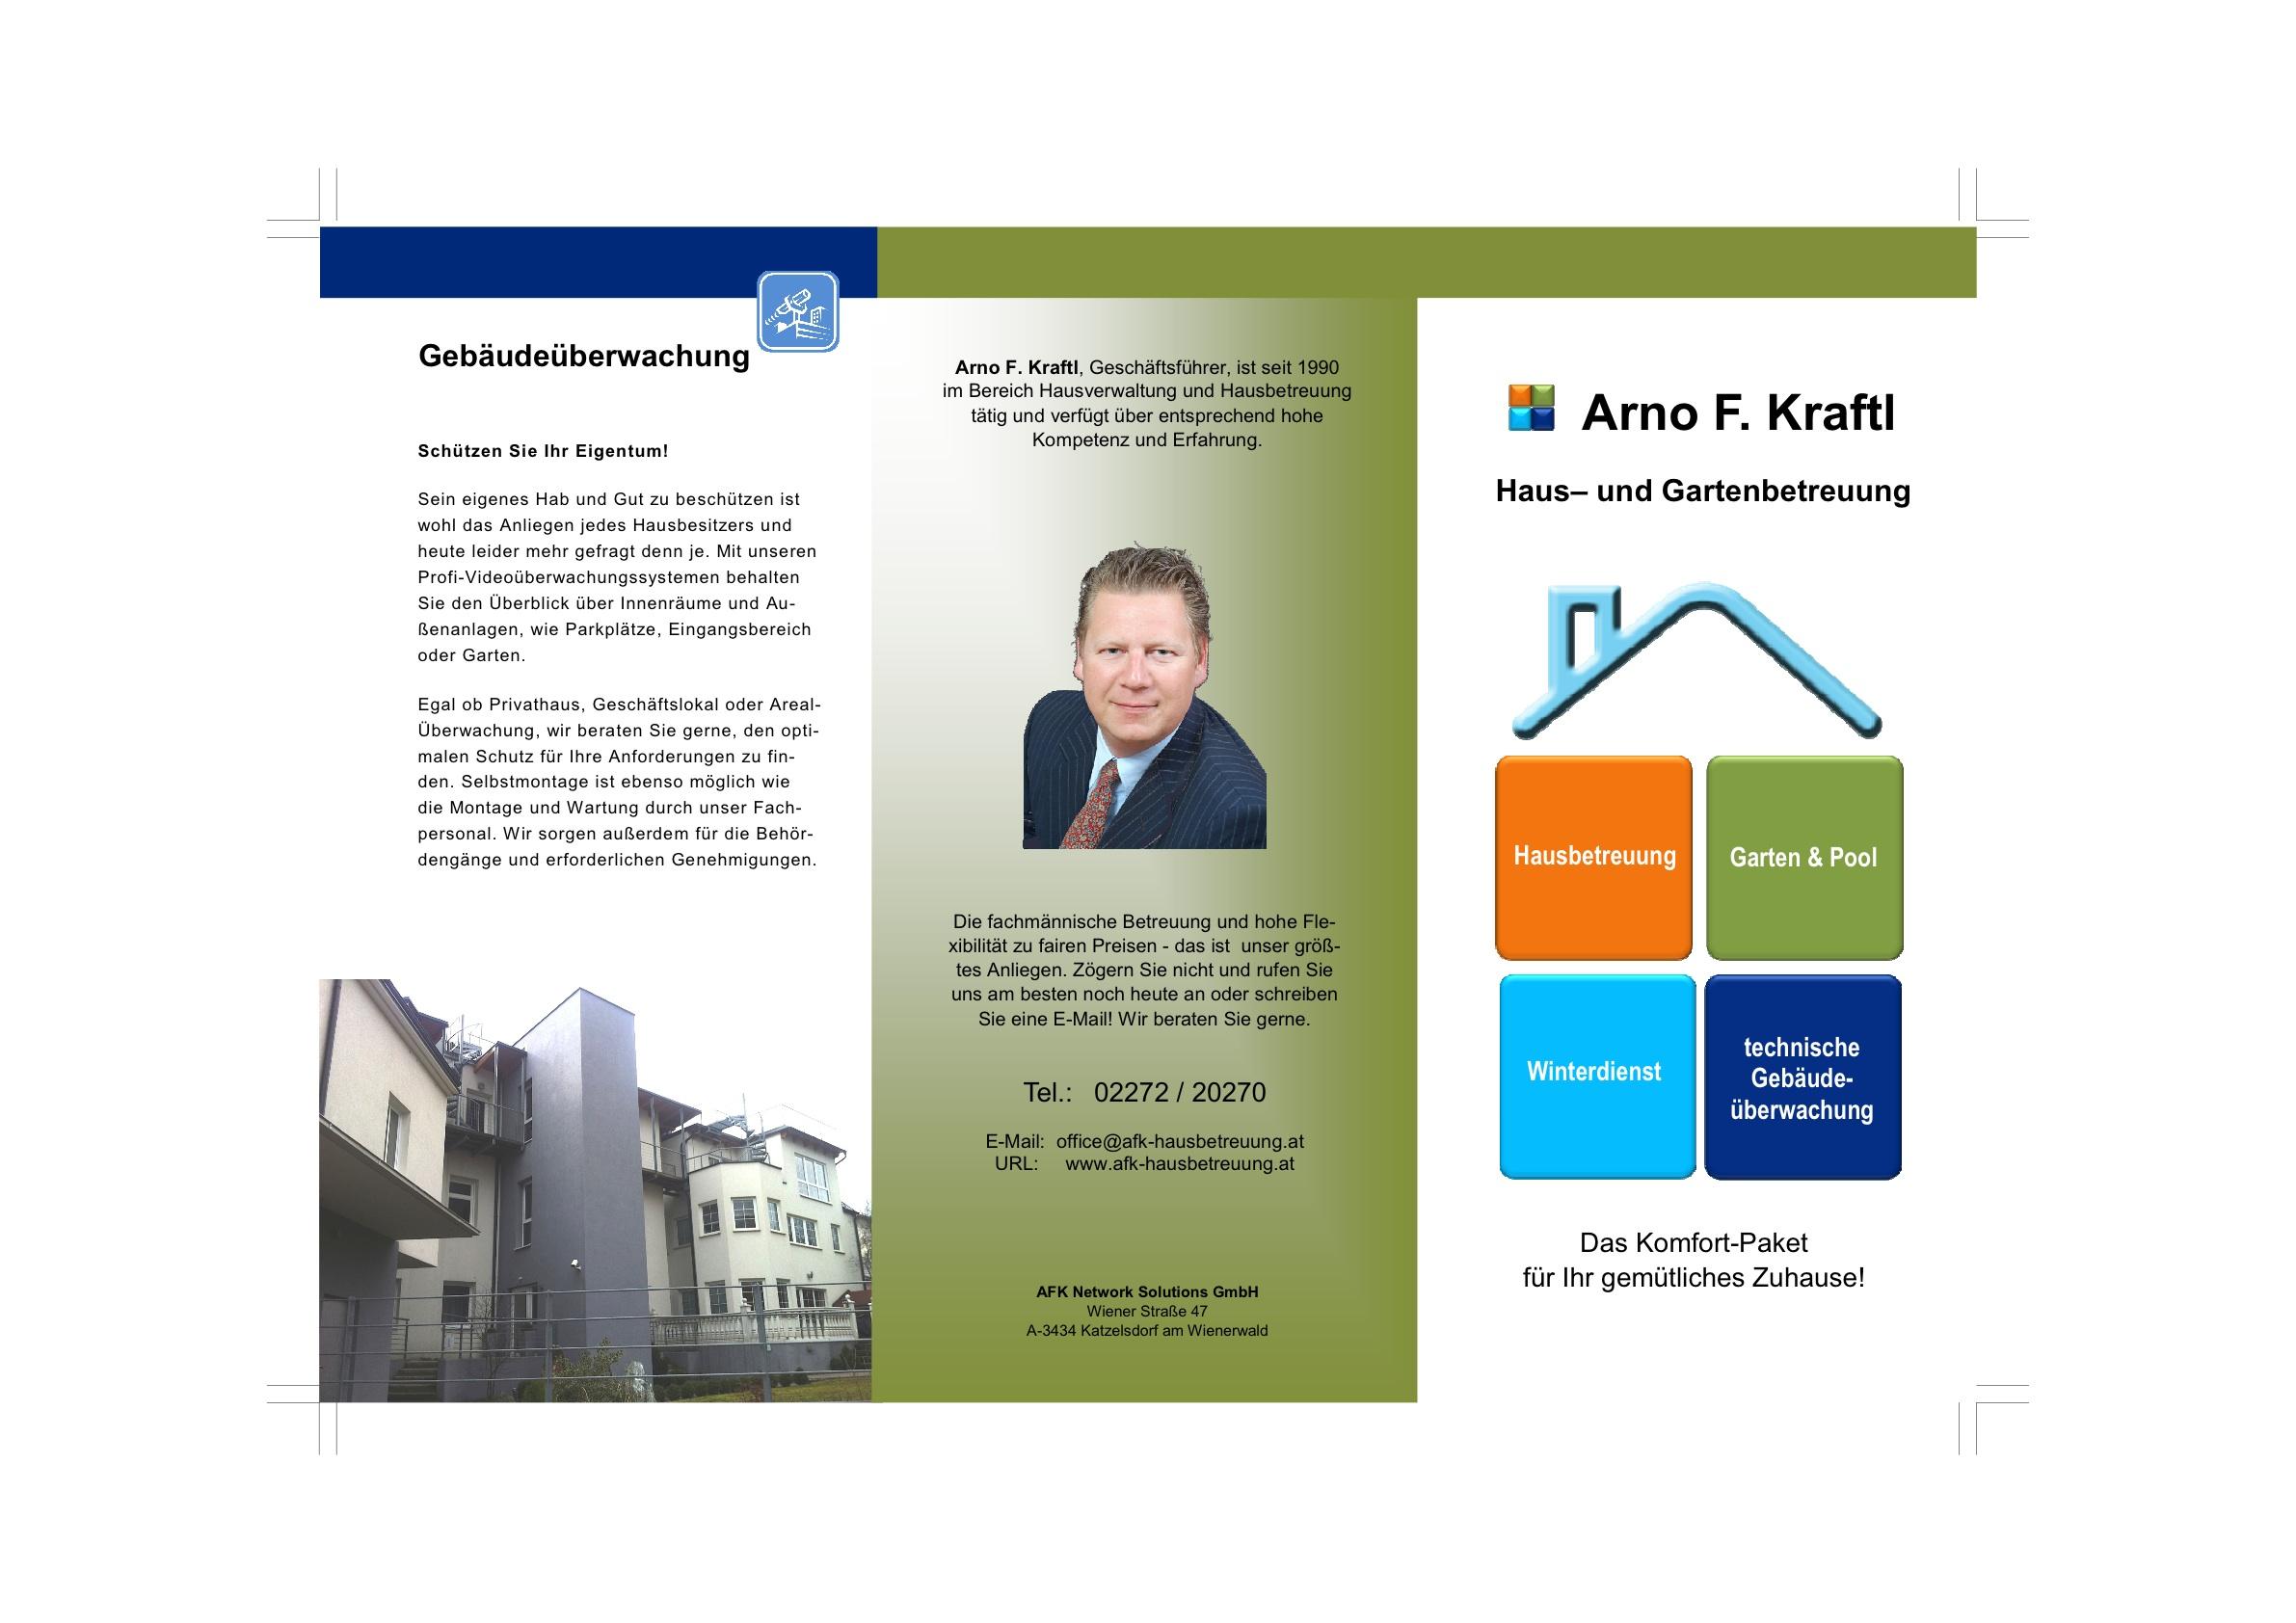 AFK-Hausbetreuung